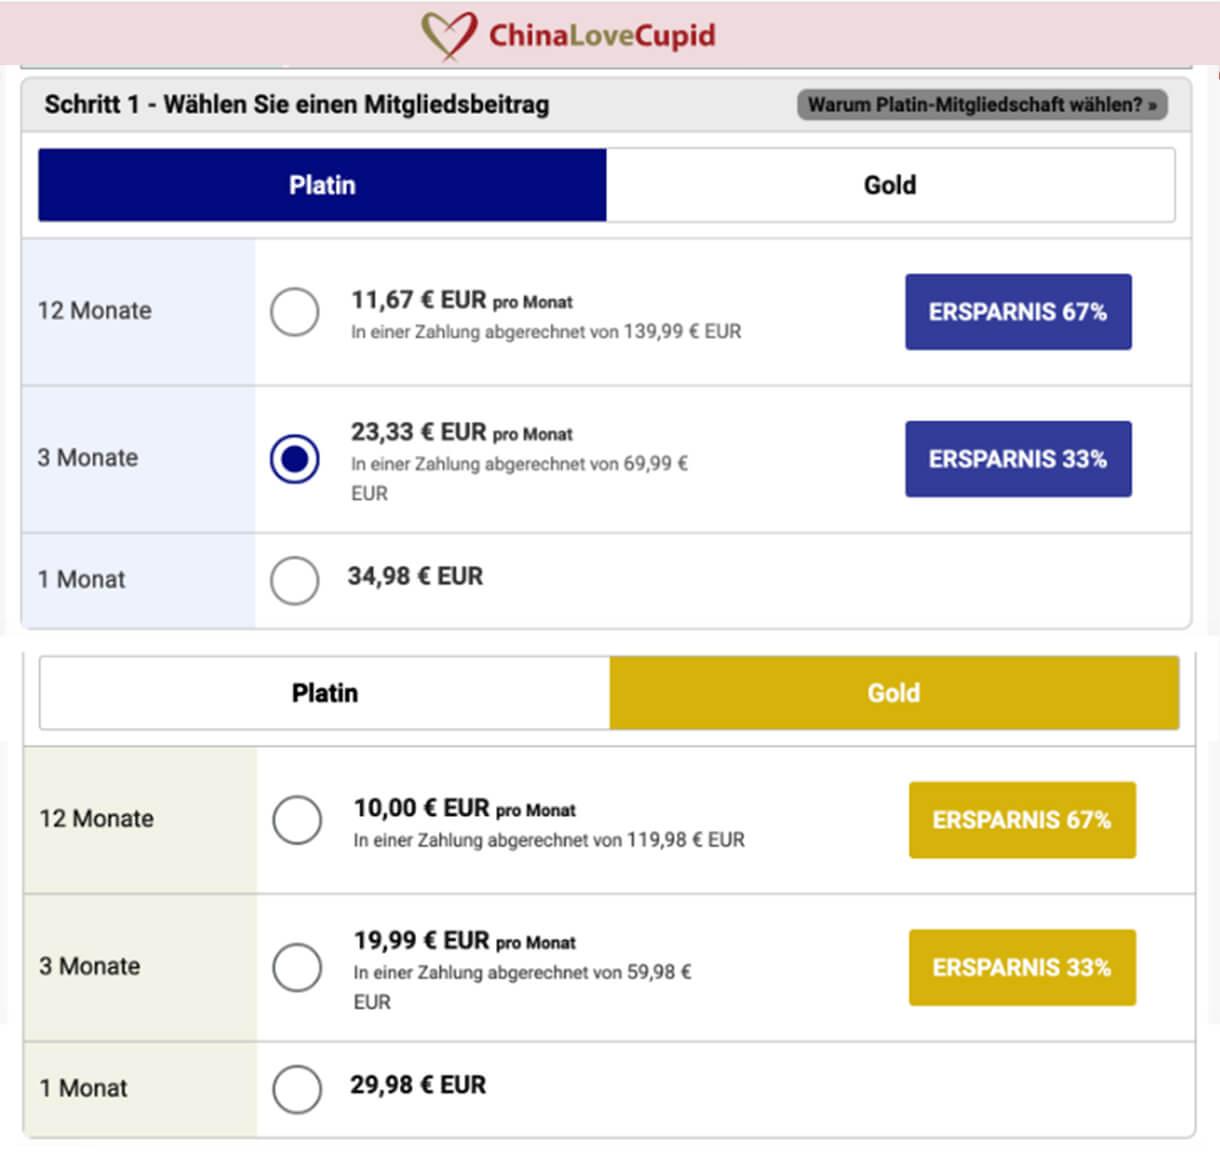 ChinaLoveCupid Preise